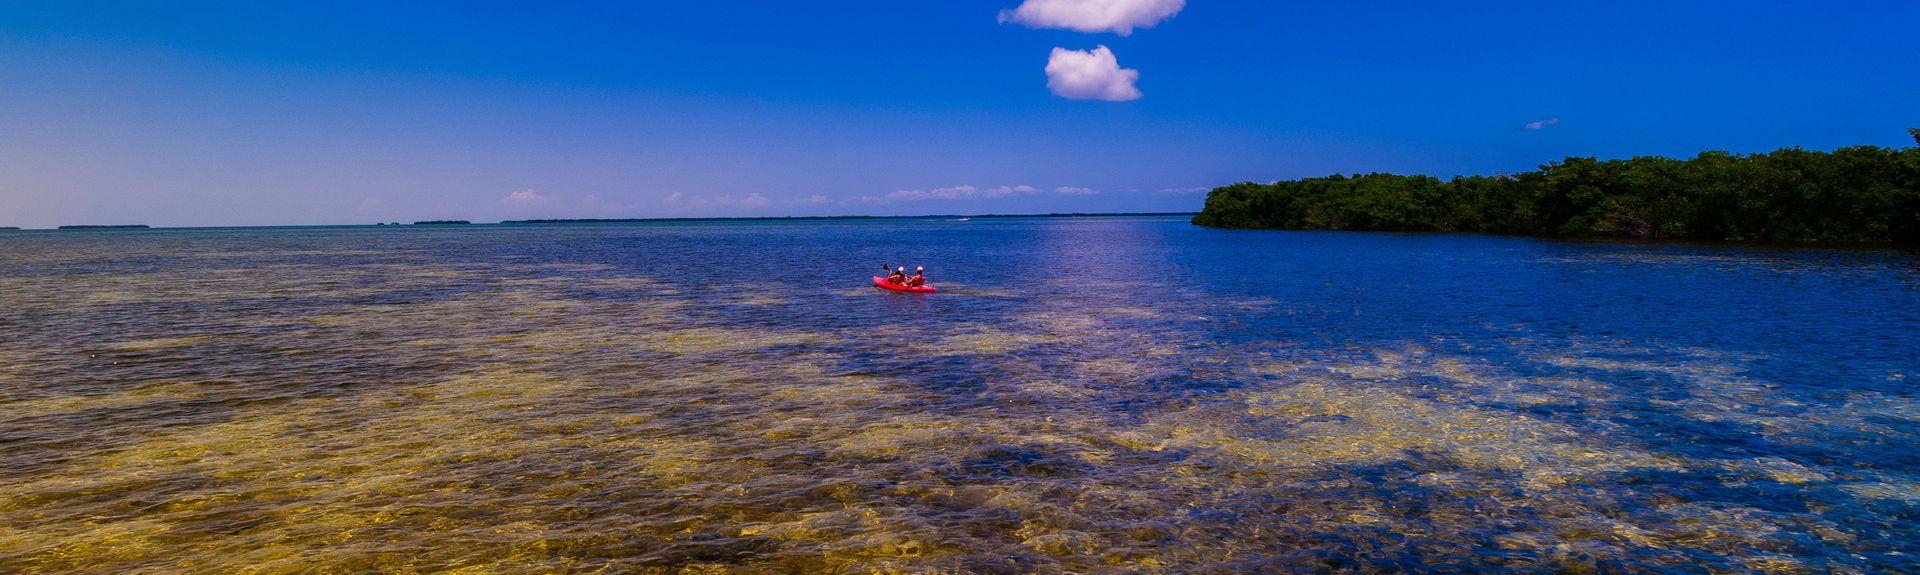 Big Pine Key, Φλόριντα, Ηνωμένες Πολιτείες